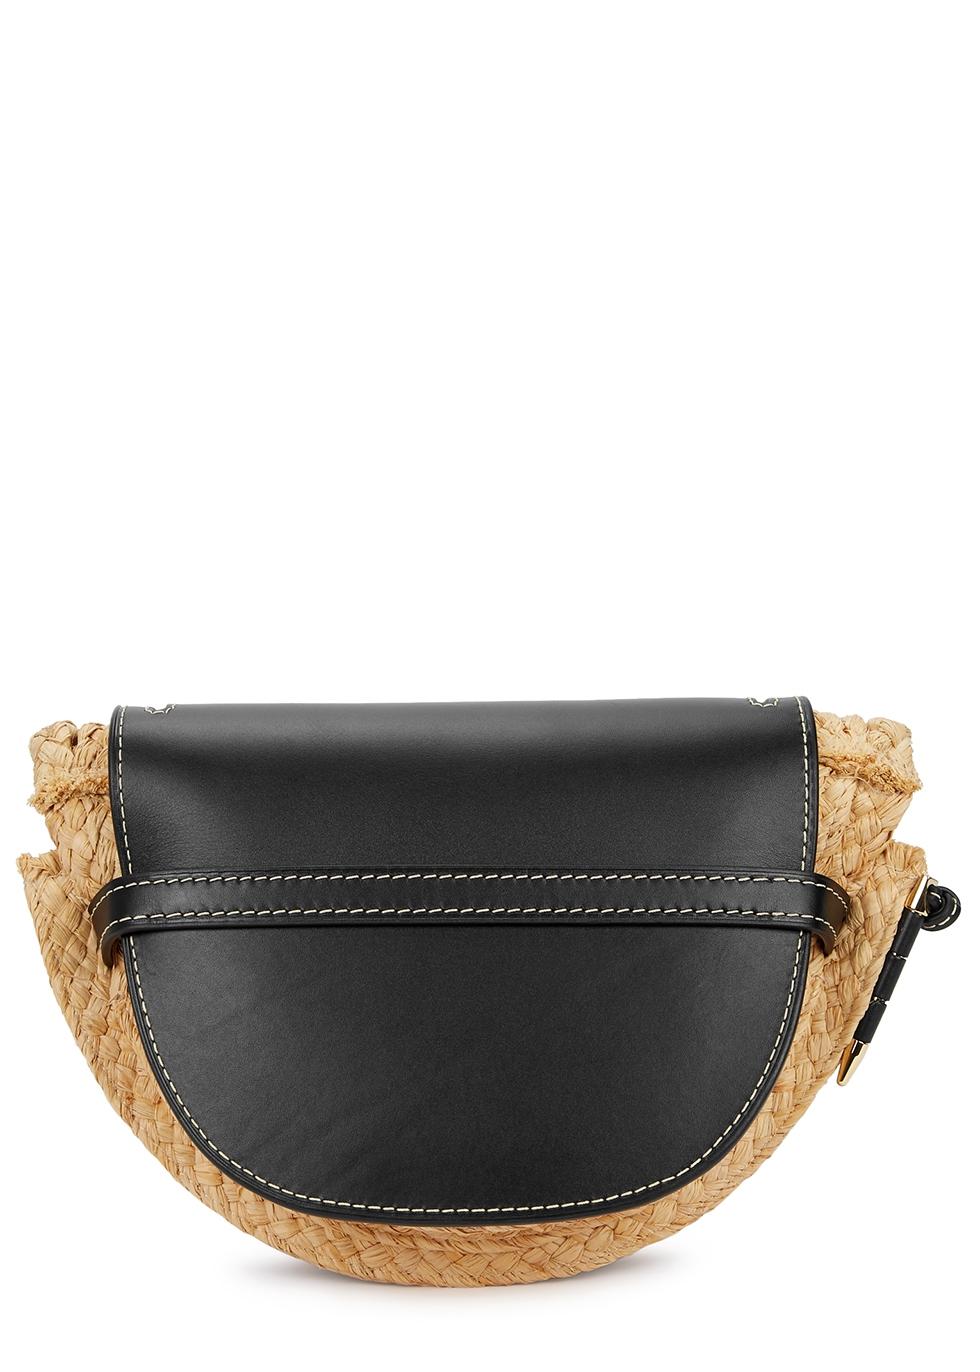 Gate small raffia saddle bag - Loewe